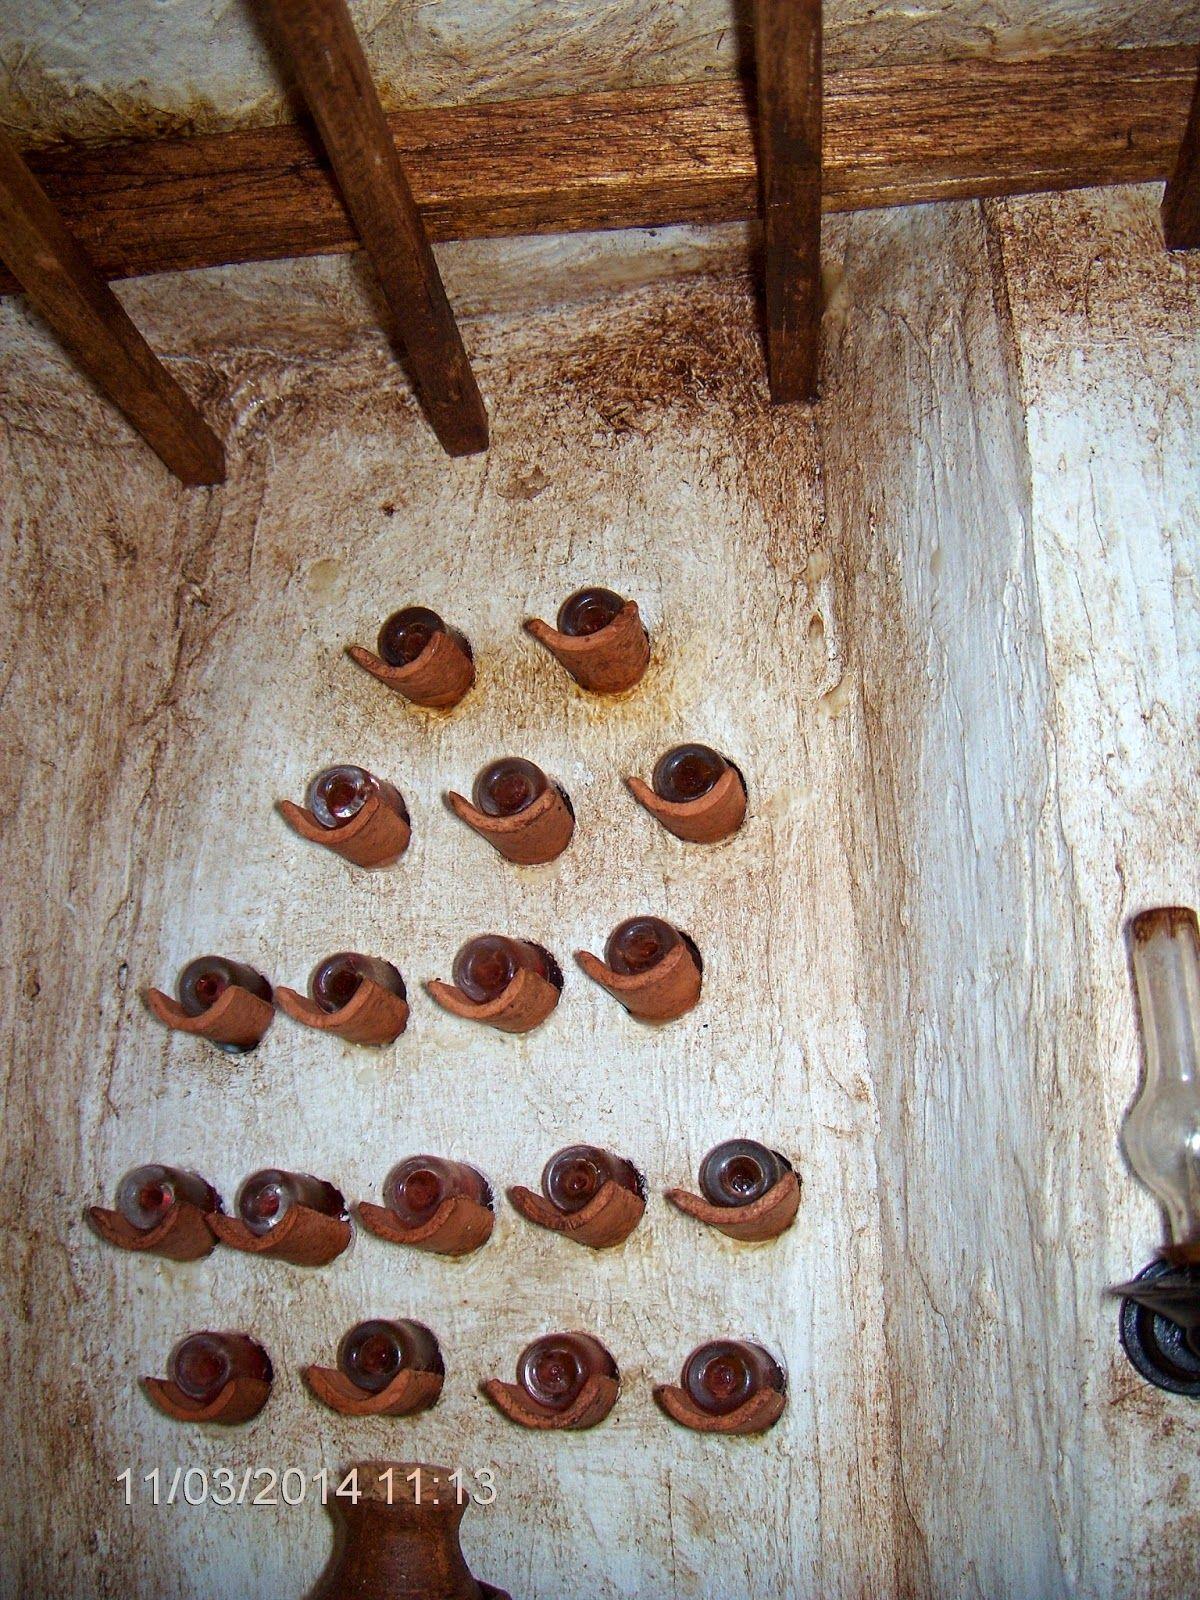 Pin de maria l pez barraj n sevilla en botelleros pinterest - Botellero de pared ...